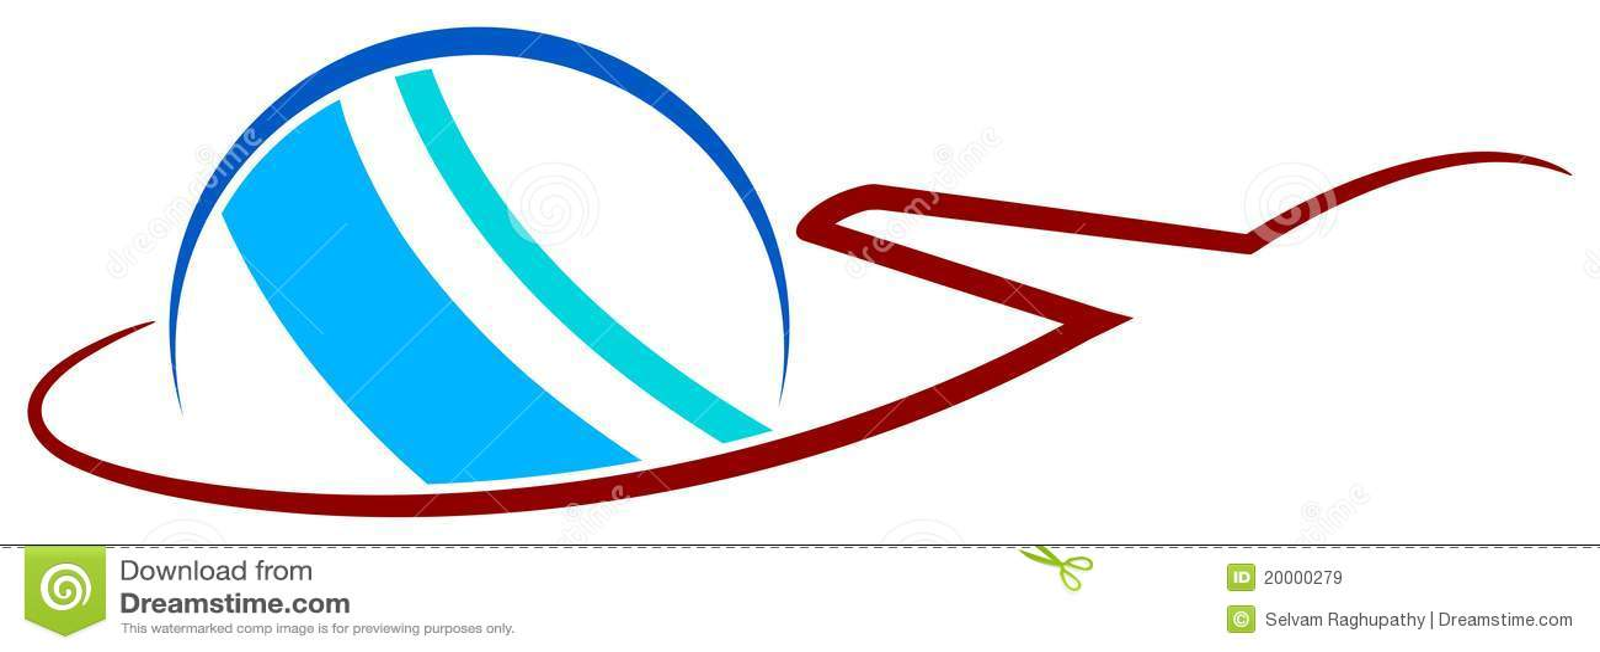 travel logo clip art - photo #20